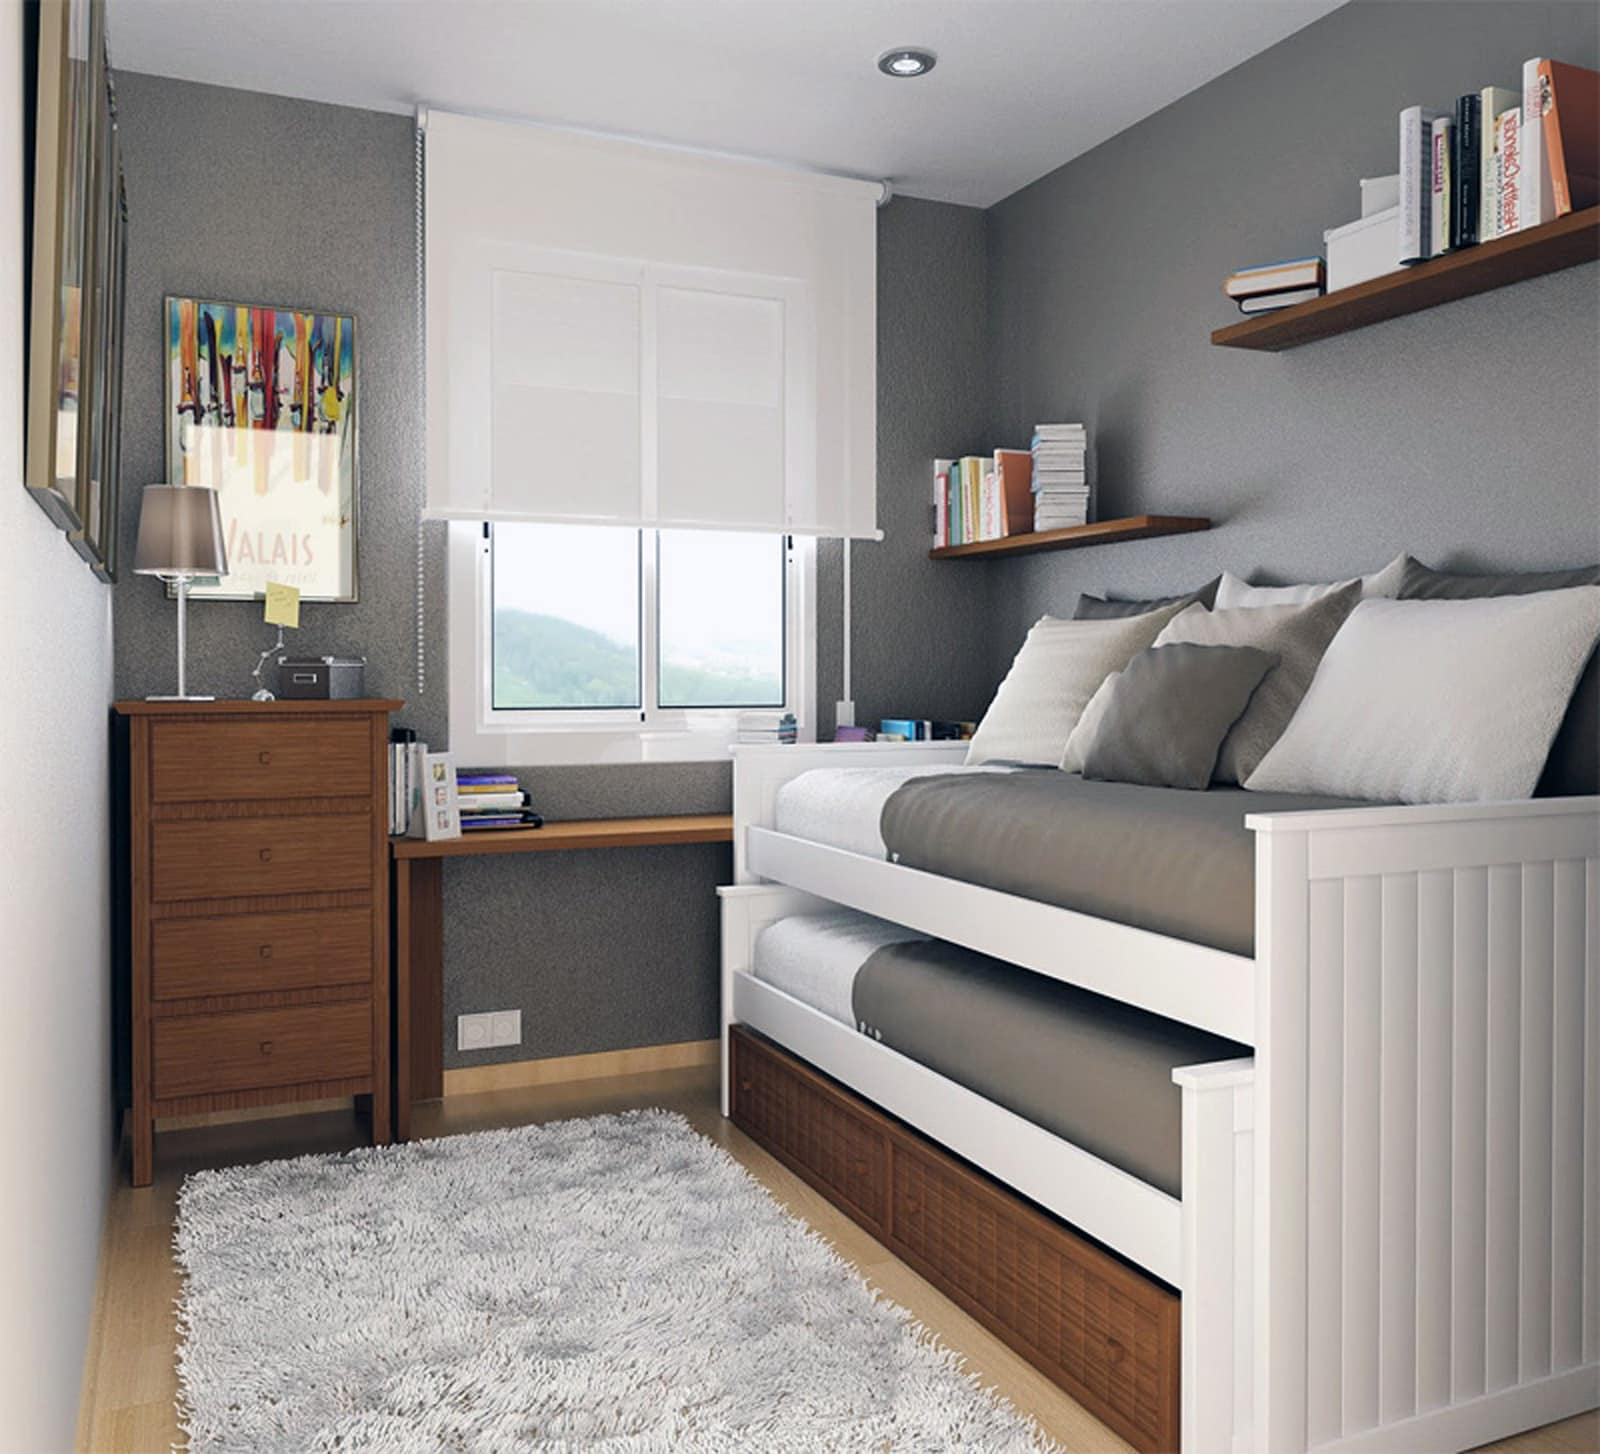 Decorar un dormitorio pequeño individual - Colchón Exprés